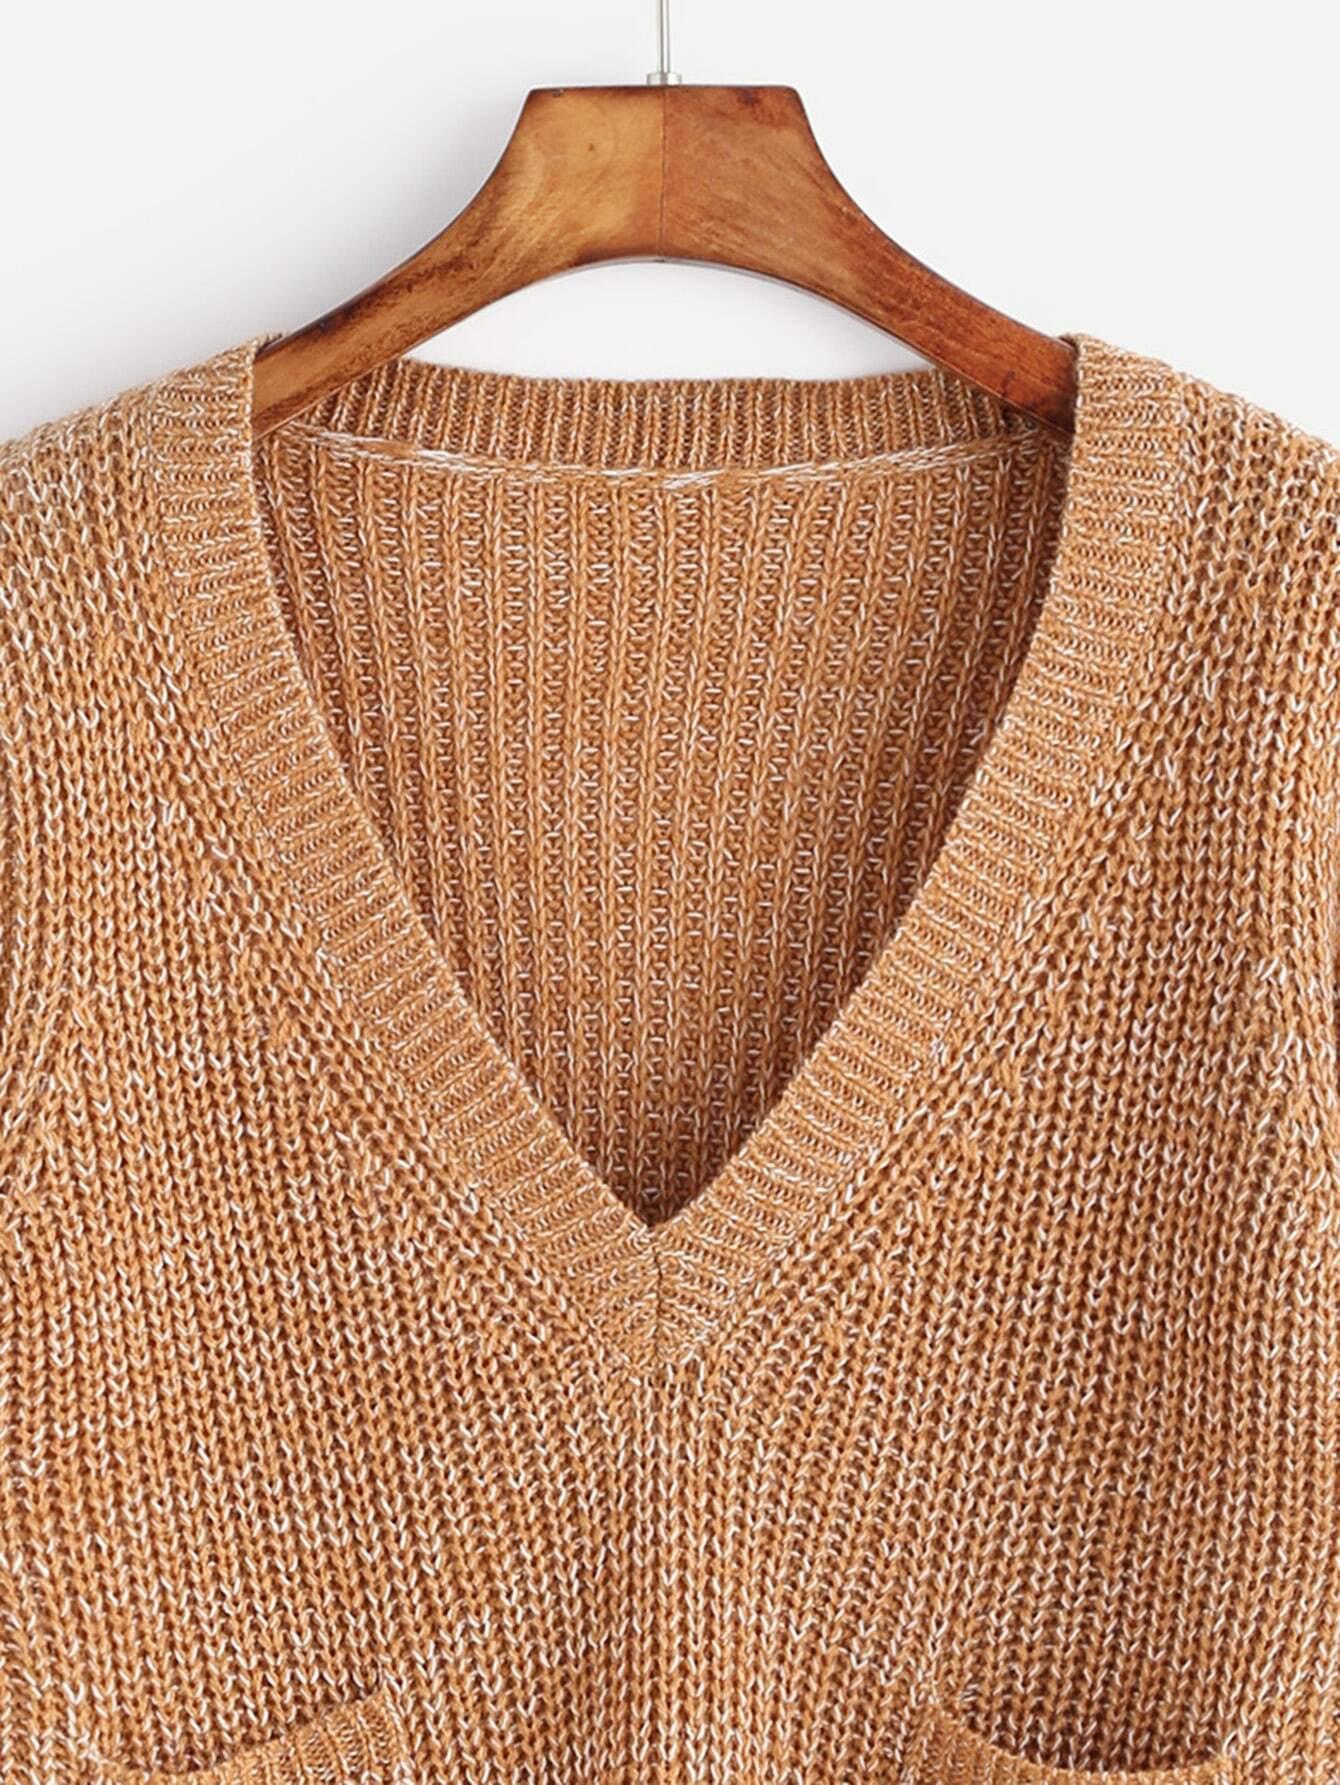 sweater161101455_2